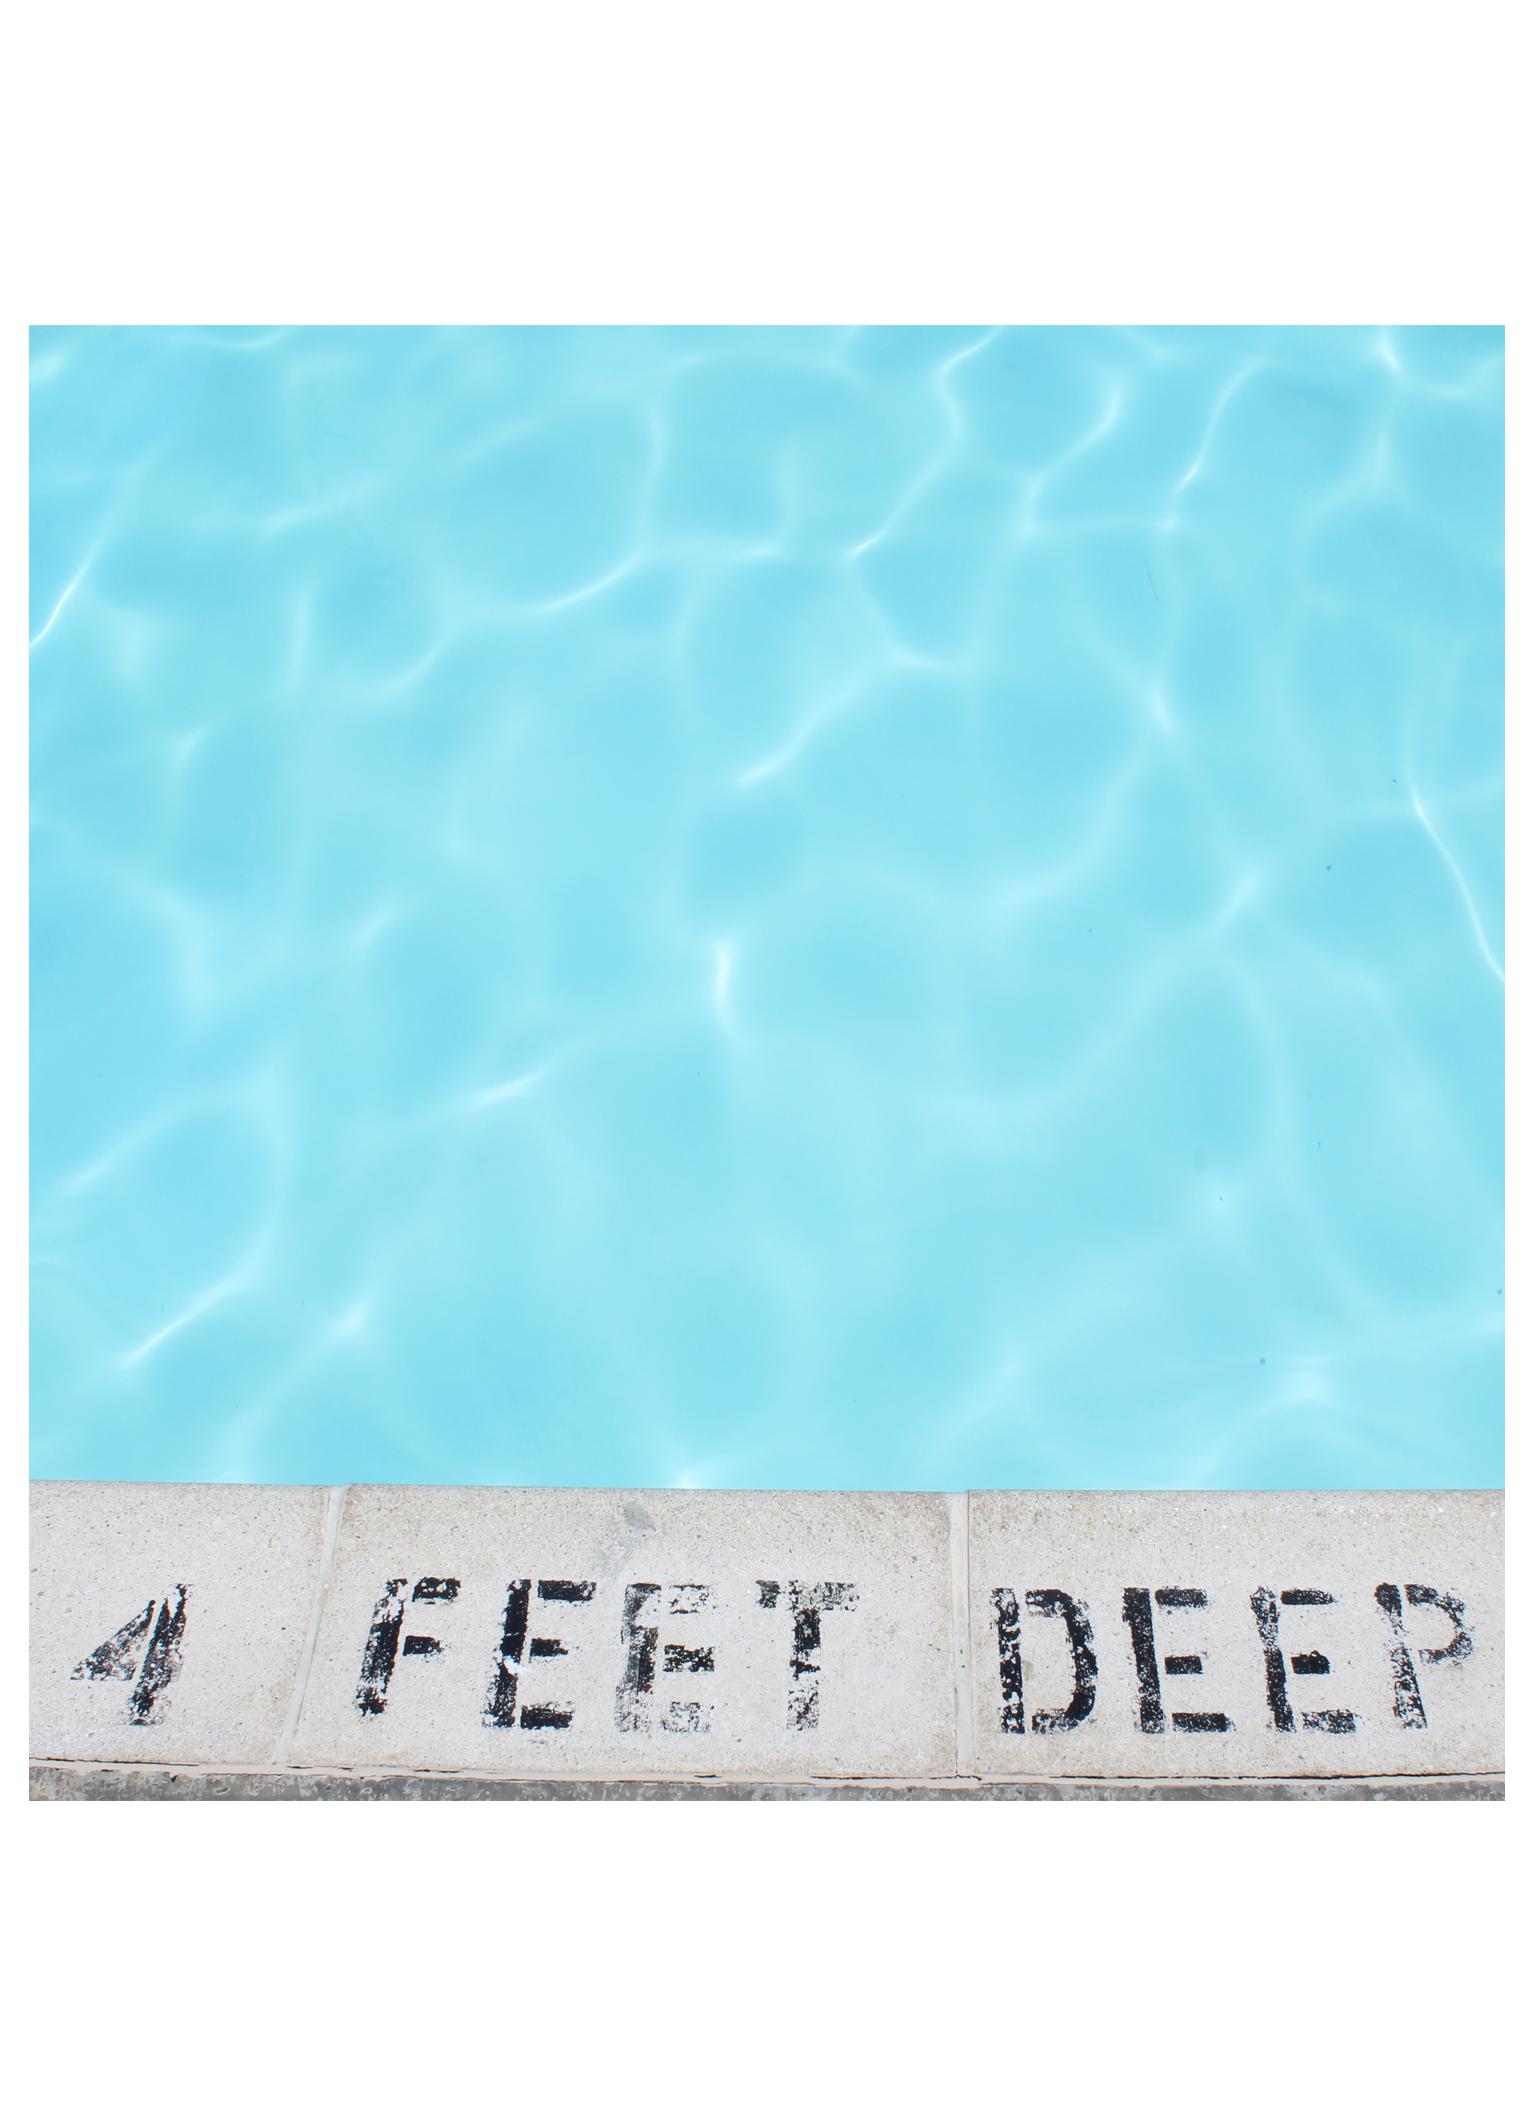 4 feet deep